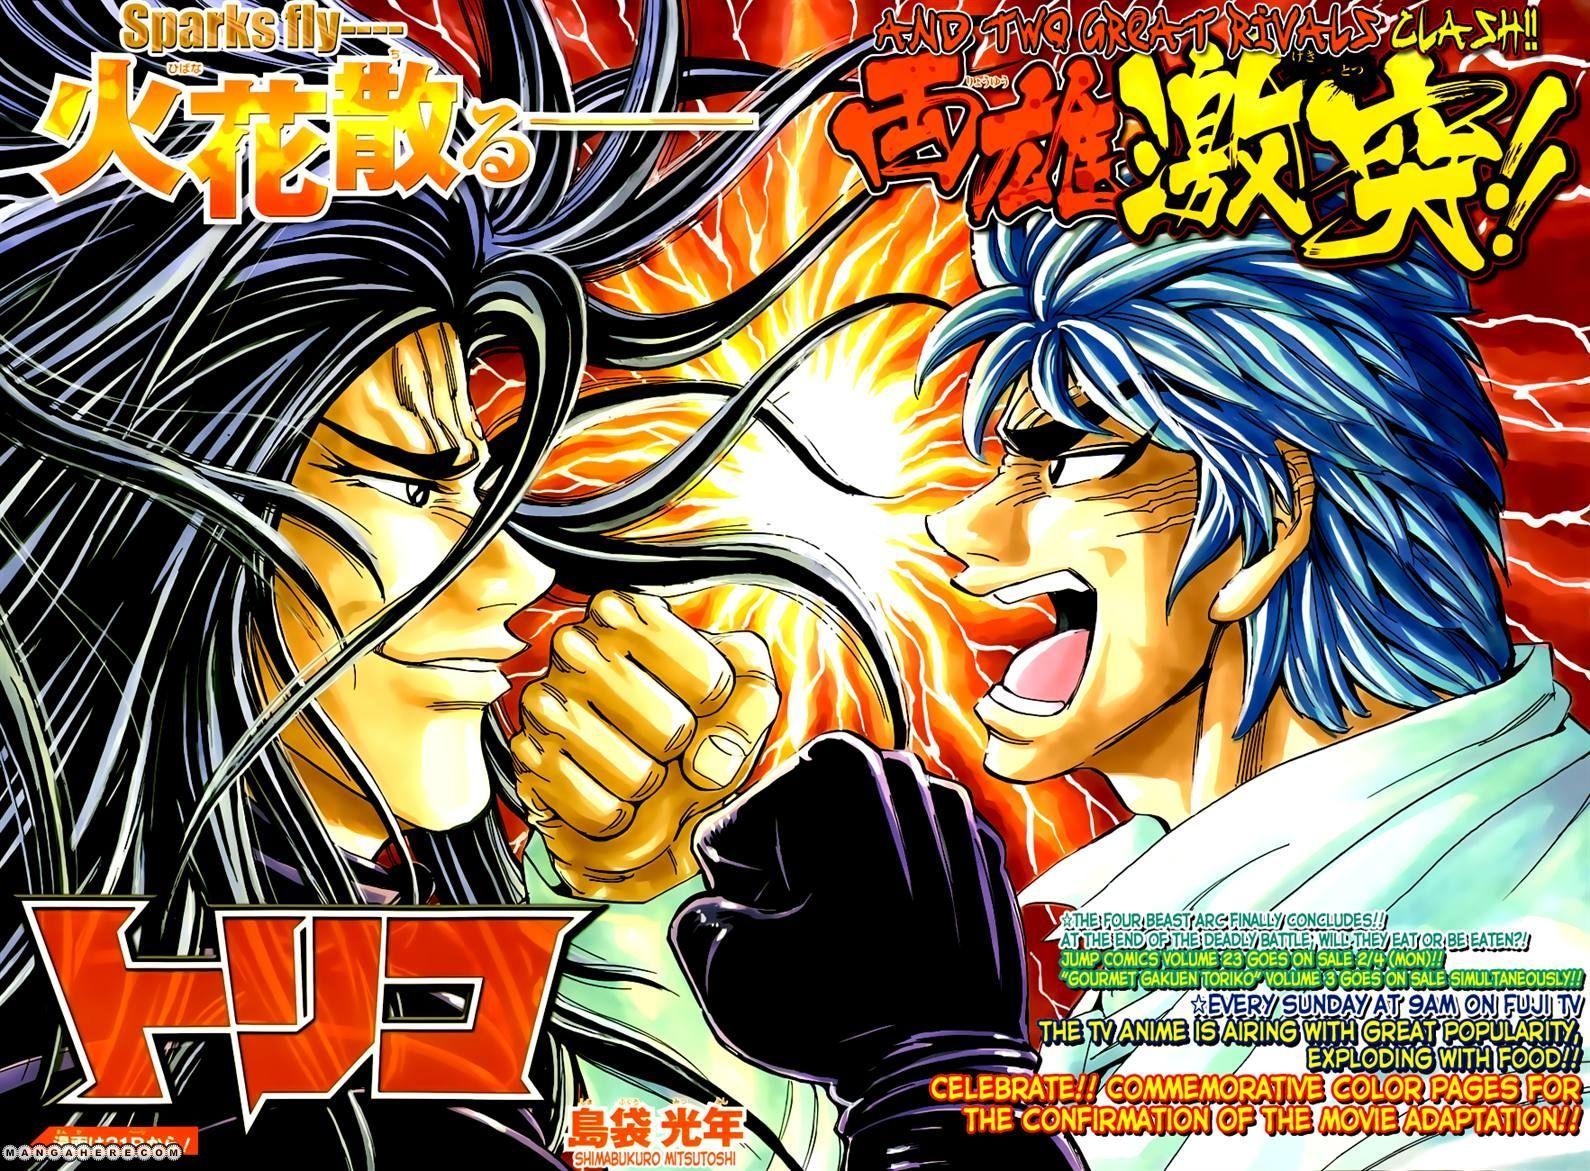 Toriko Wallpaper Read Toriko Manga Online At Mangagrounds Toriko Anime And Manga Forums